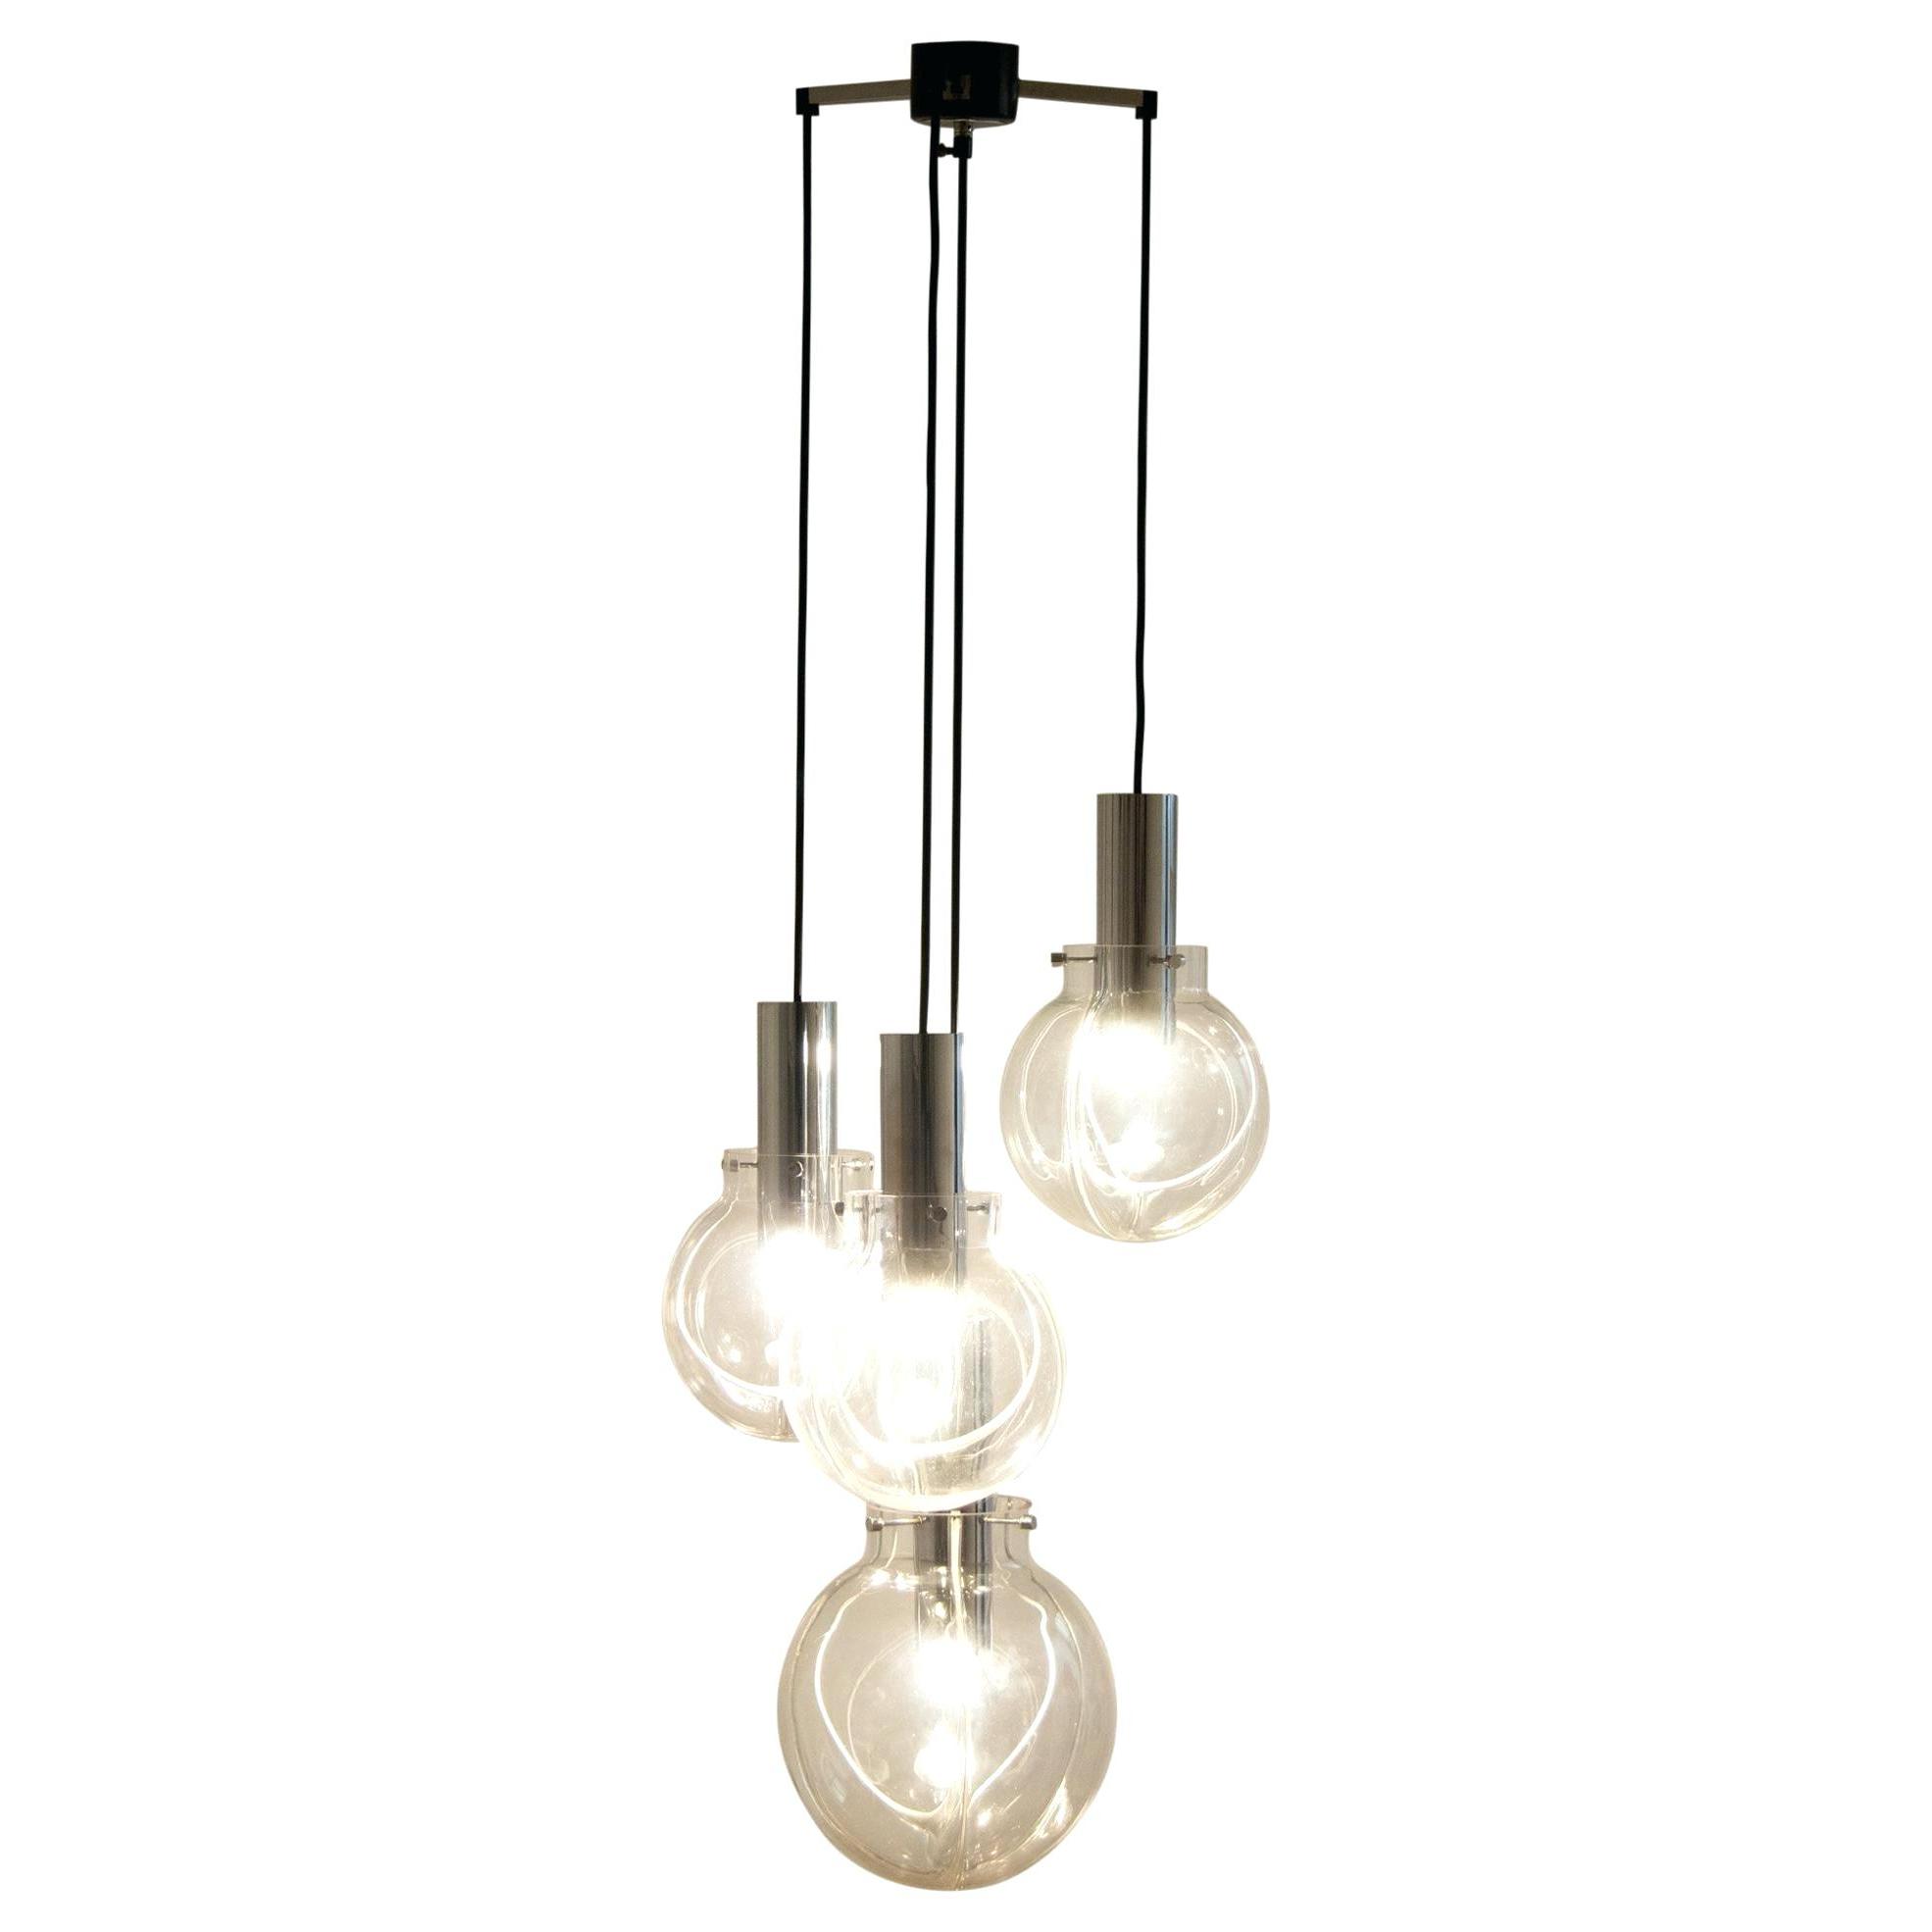 2020 Gregoire 6 Light Globe Chandeliers Intended For Globe Light Chandelier – Theflex (View 19 of 25)